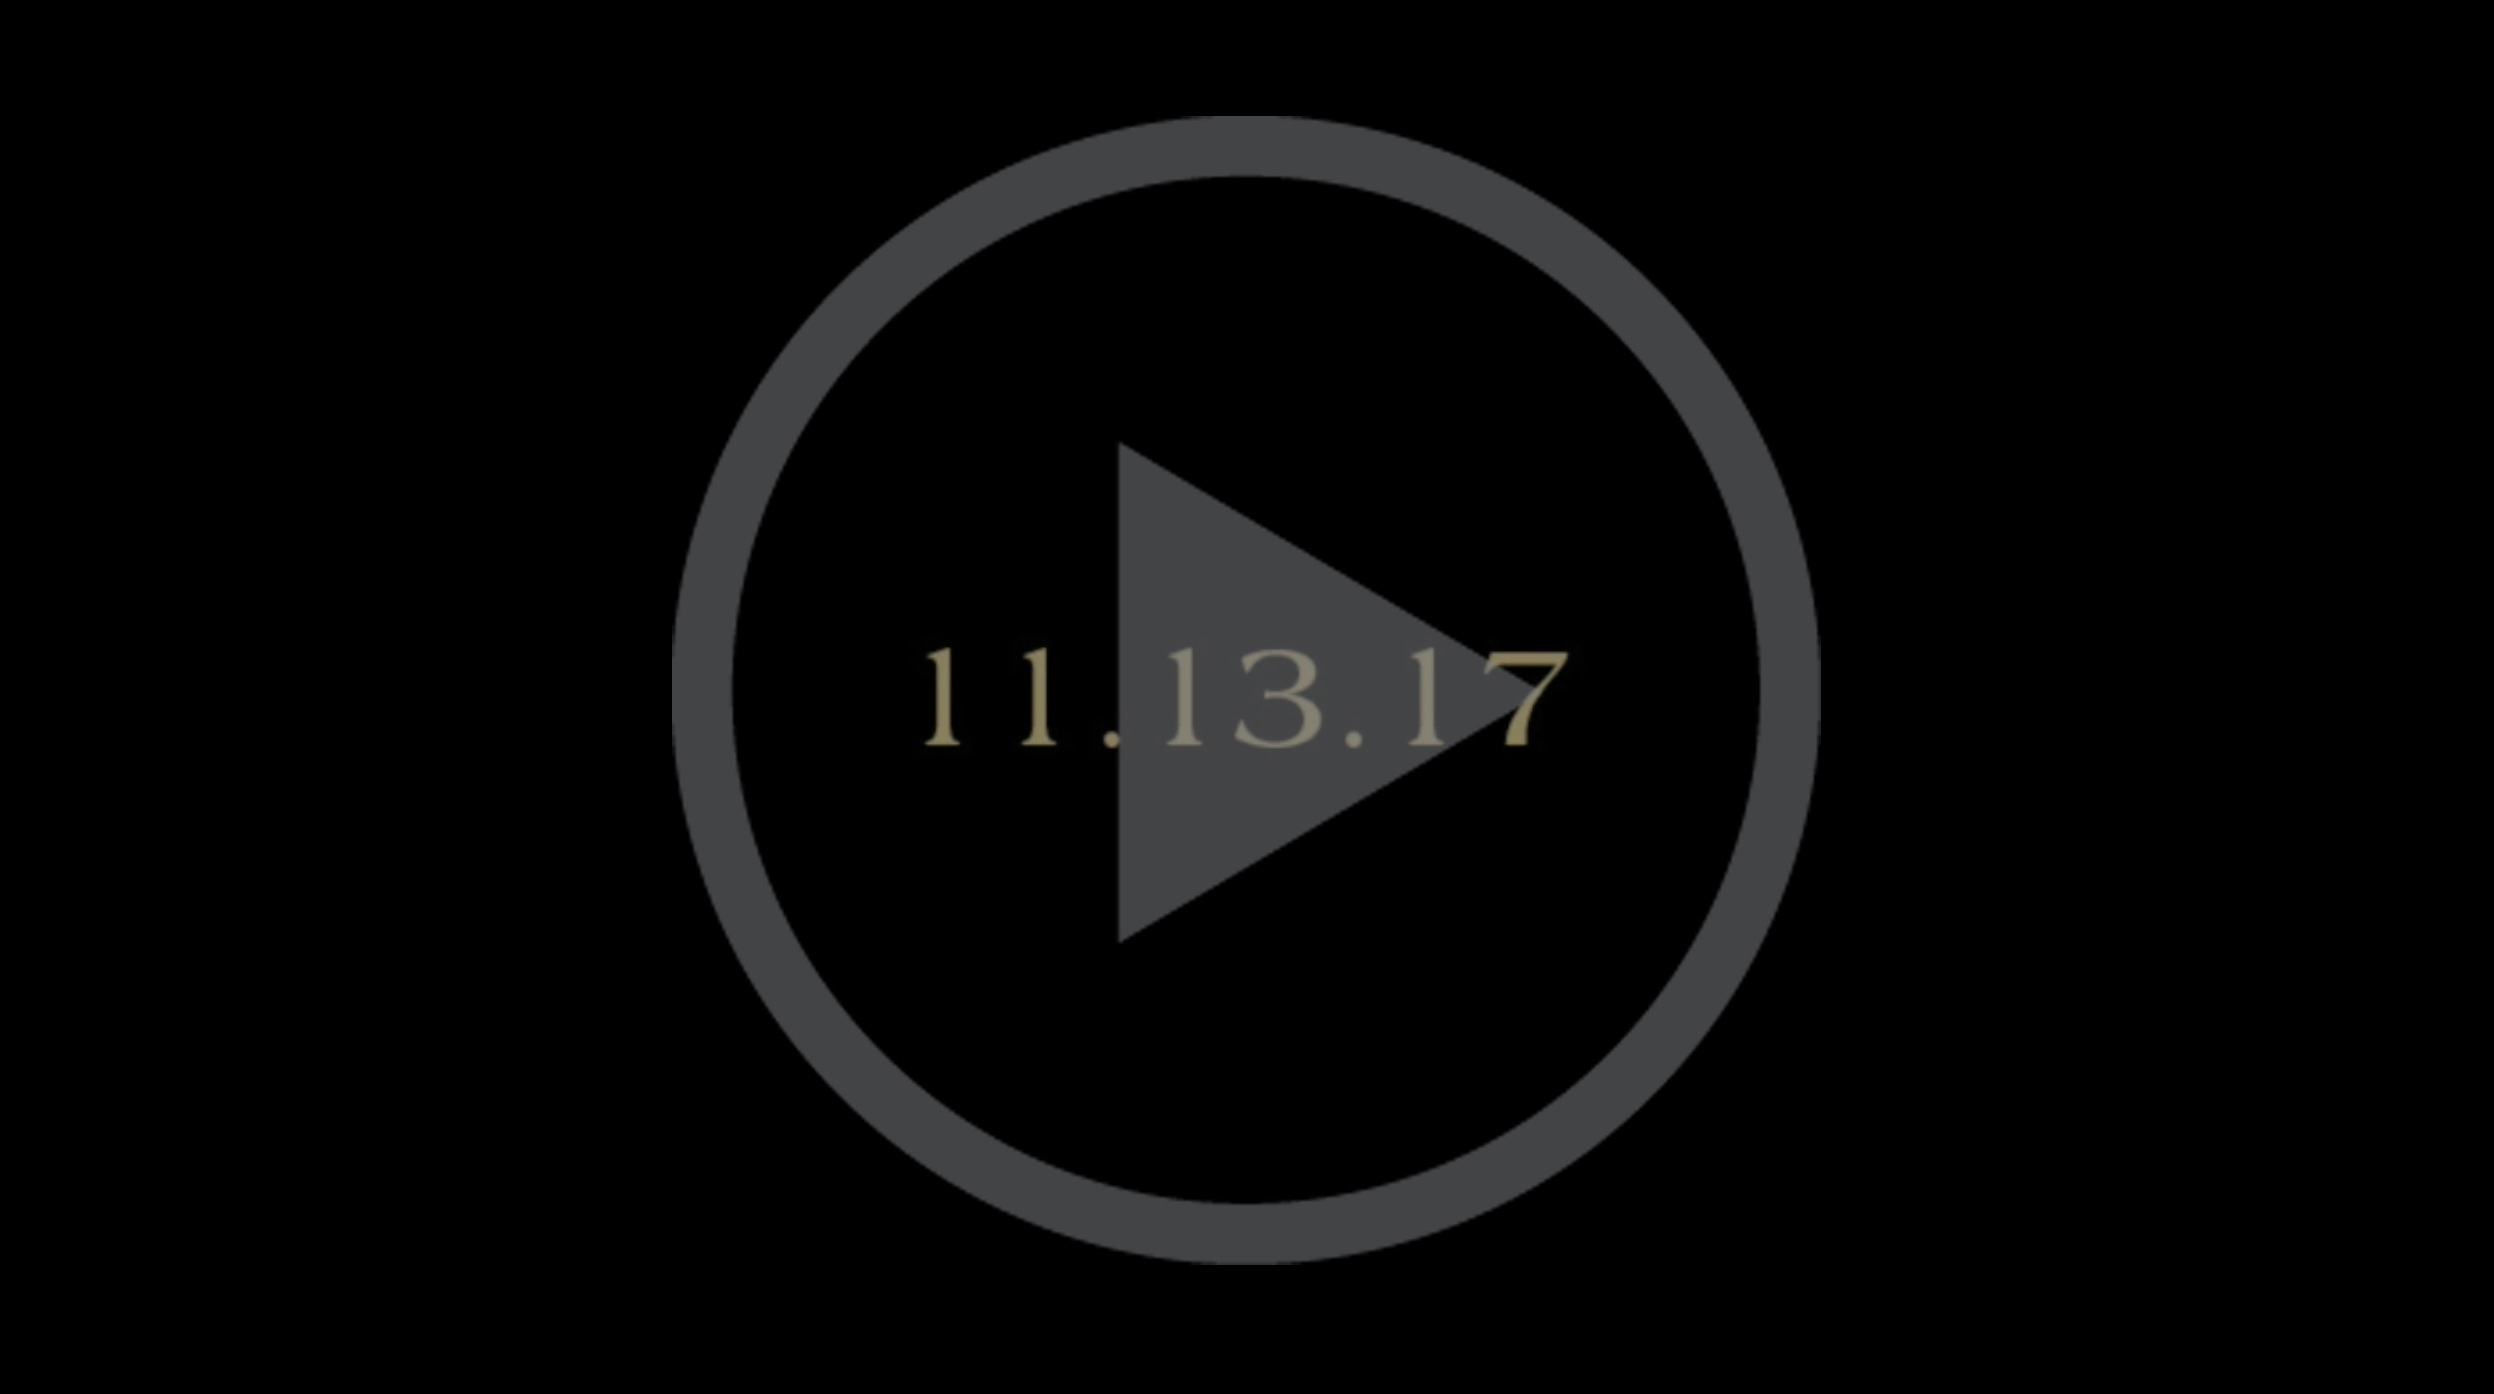 Screen Shot 2017-11-09 at 12.03.59 PM.jpg